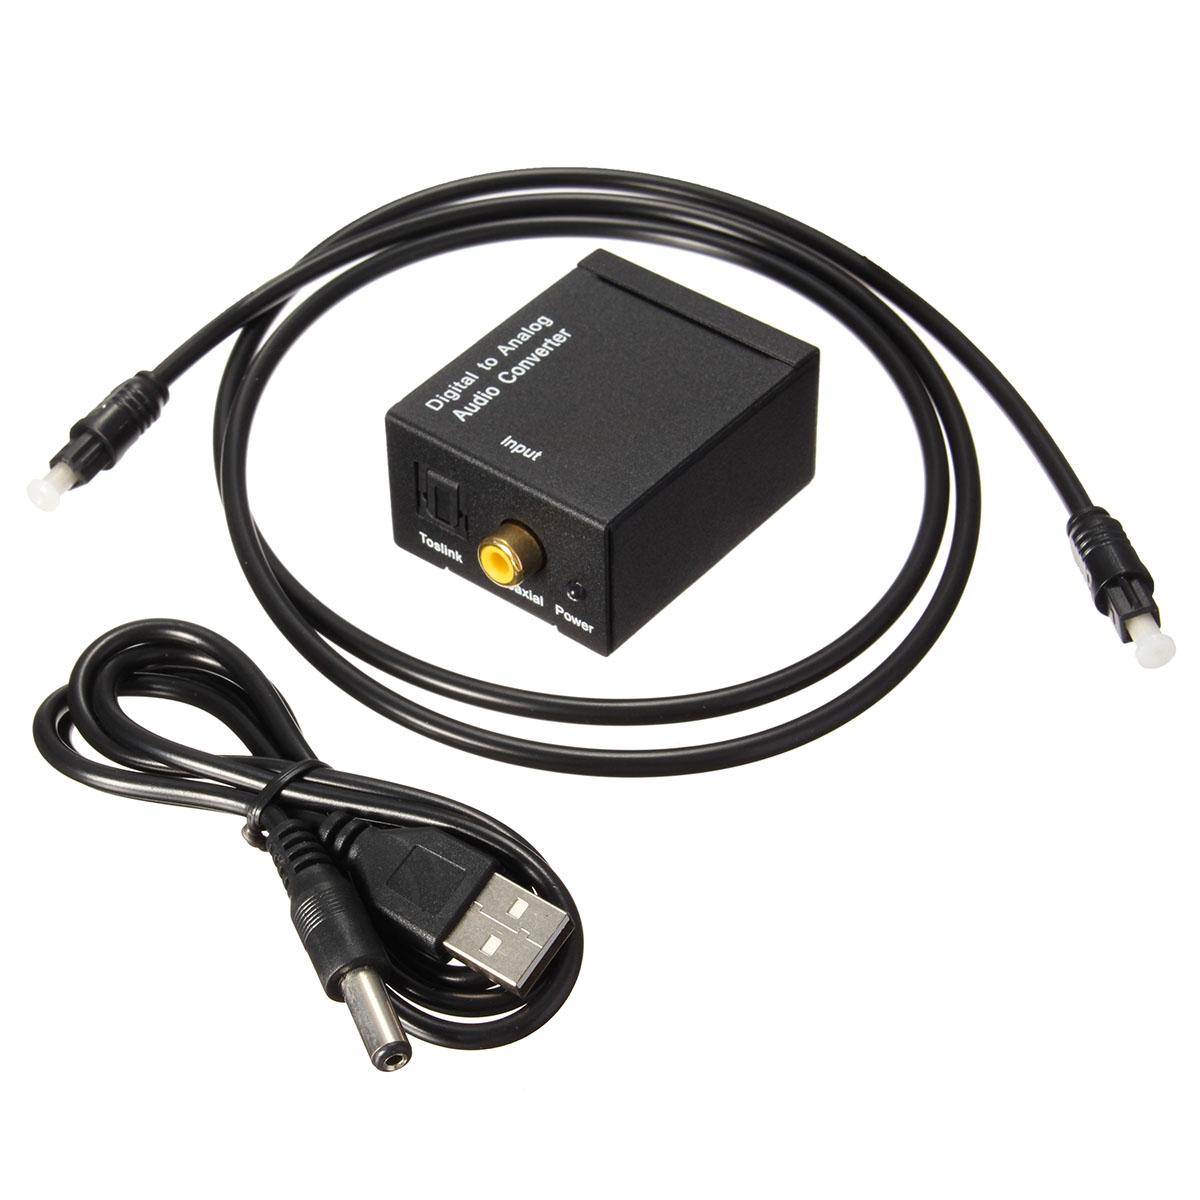 digital optical coax coaxial toslink to analog audio converter adapter rca l r alex nld. Black Bedroom Furniture Sets. Home Design Ideas